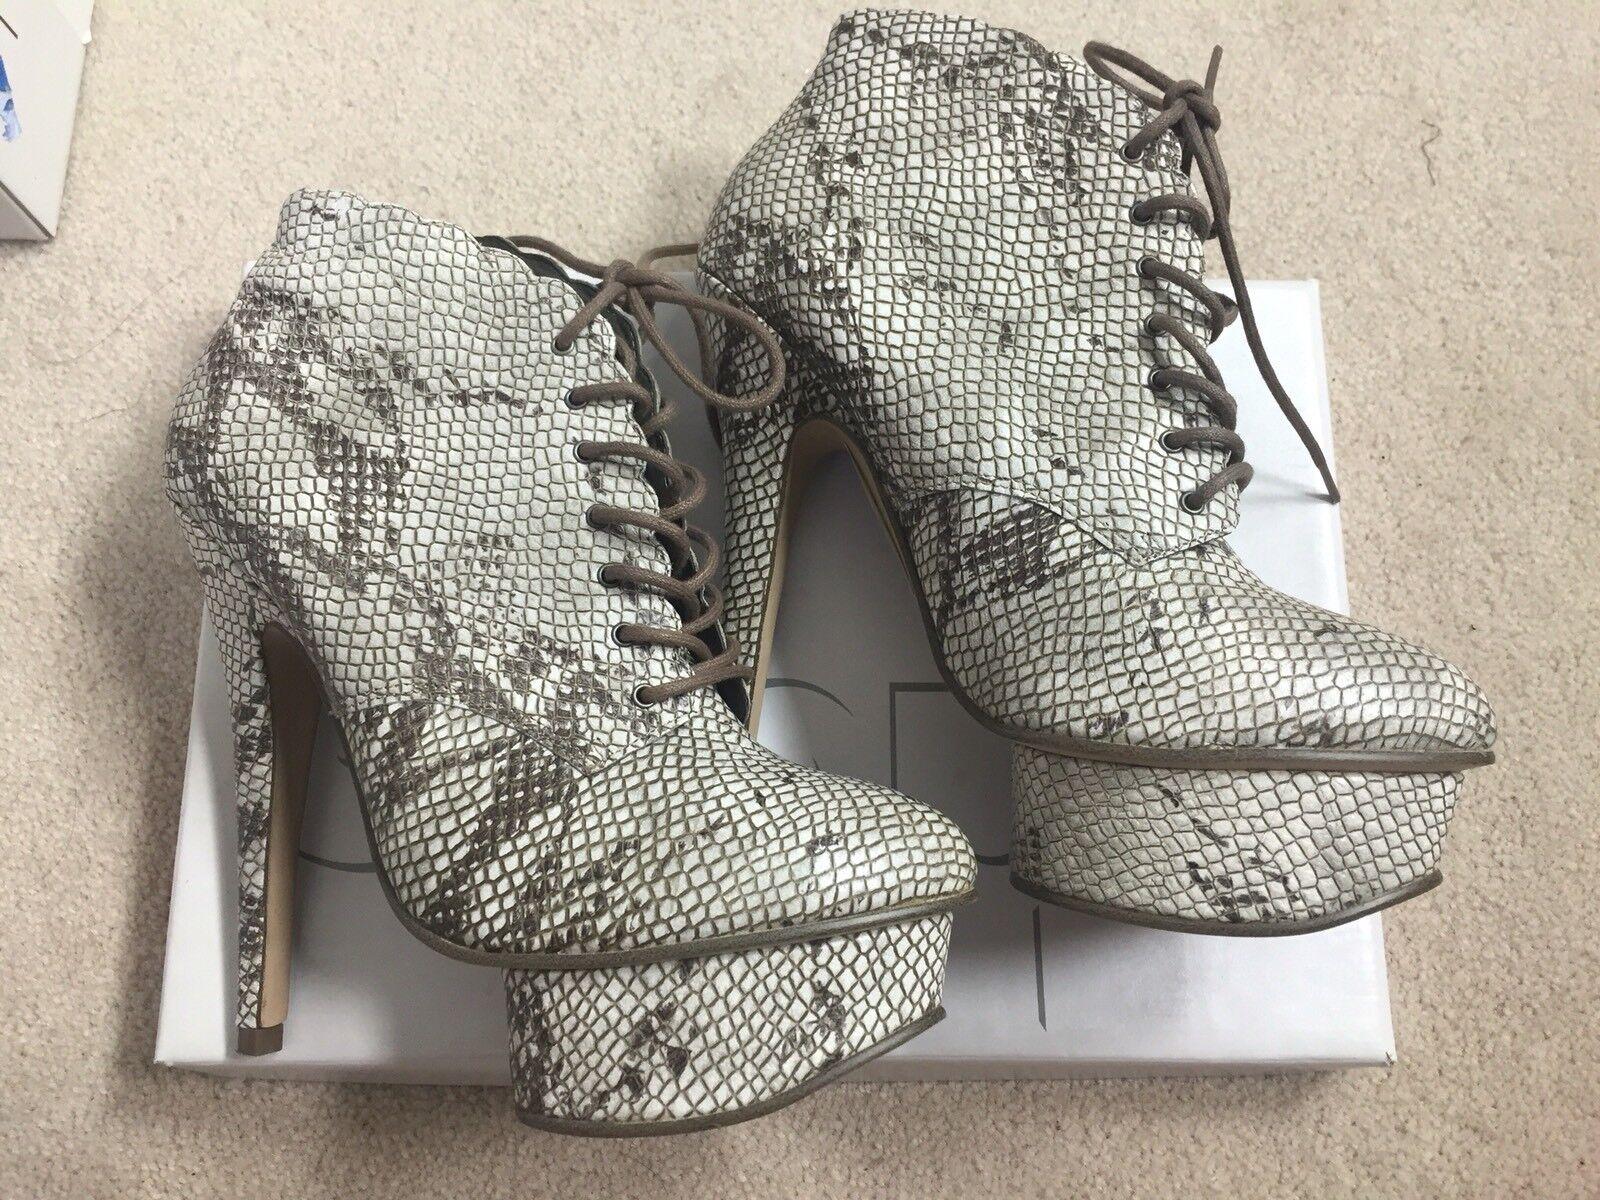 Brand New In Box Topshop Snakeskin High Heel Pump Platform Boots - Size 7.5 38